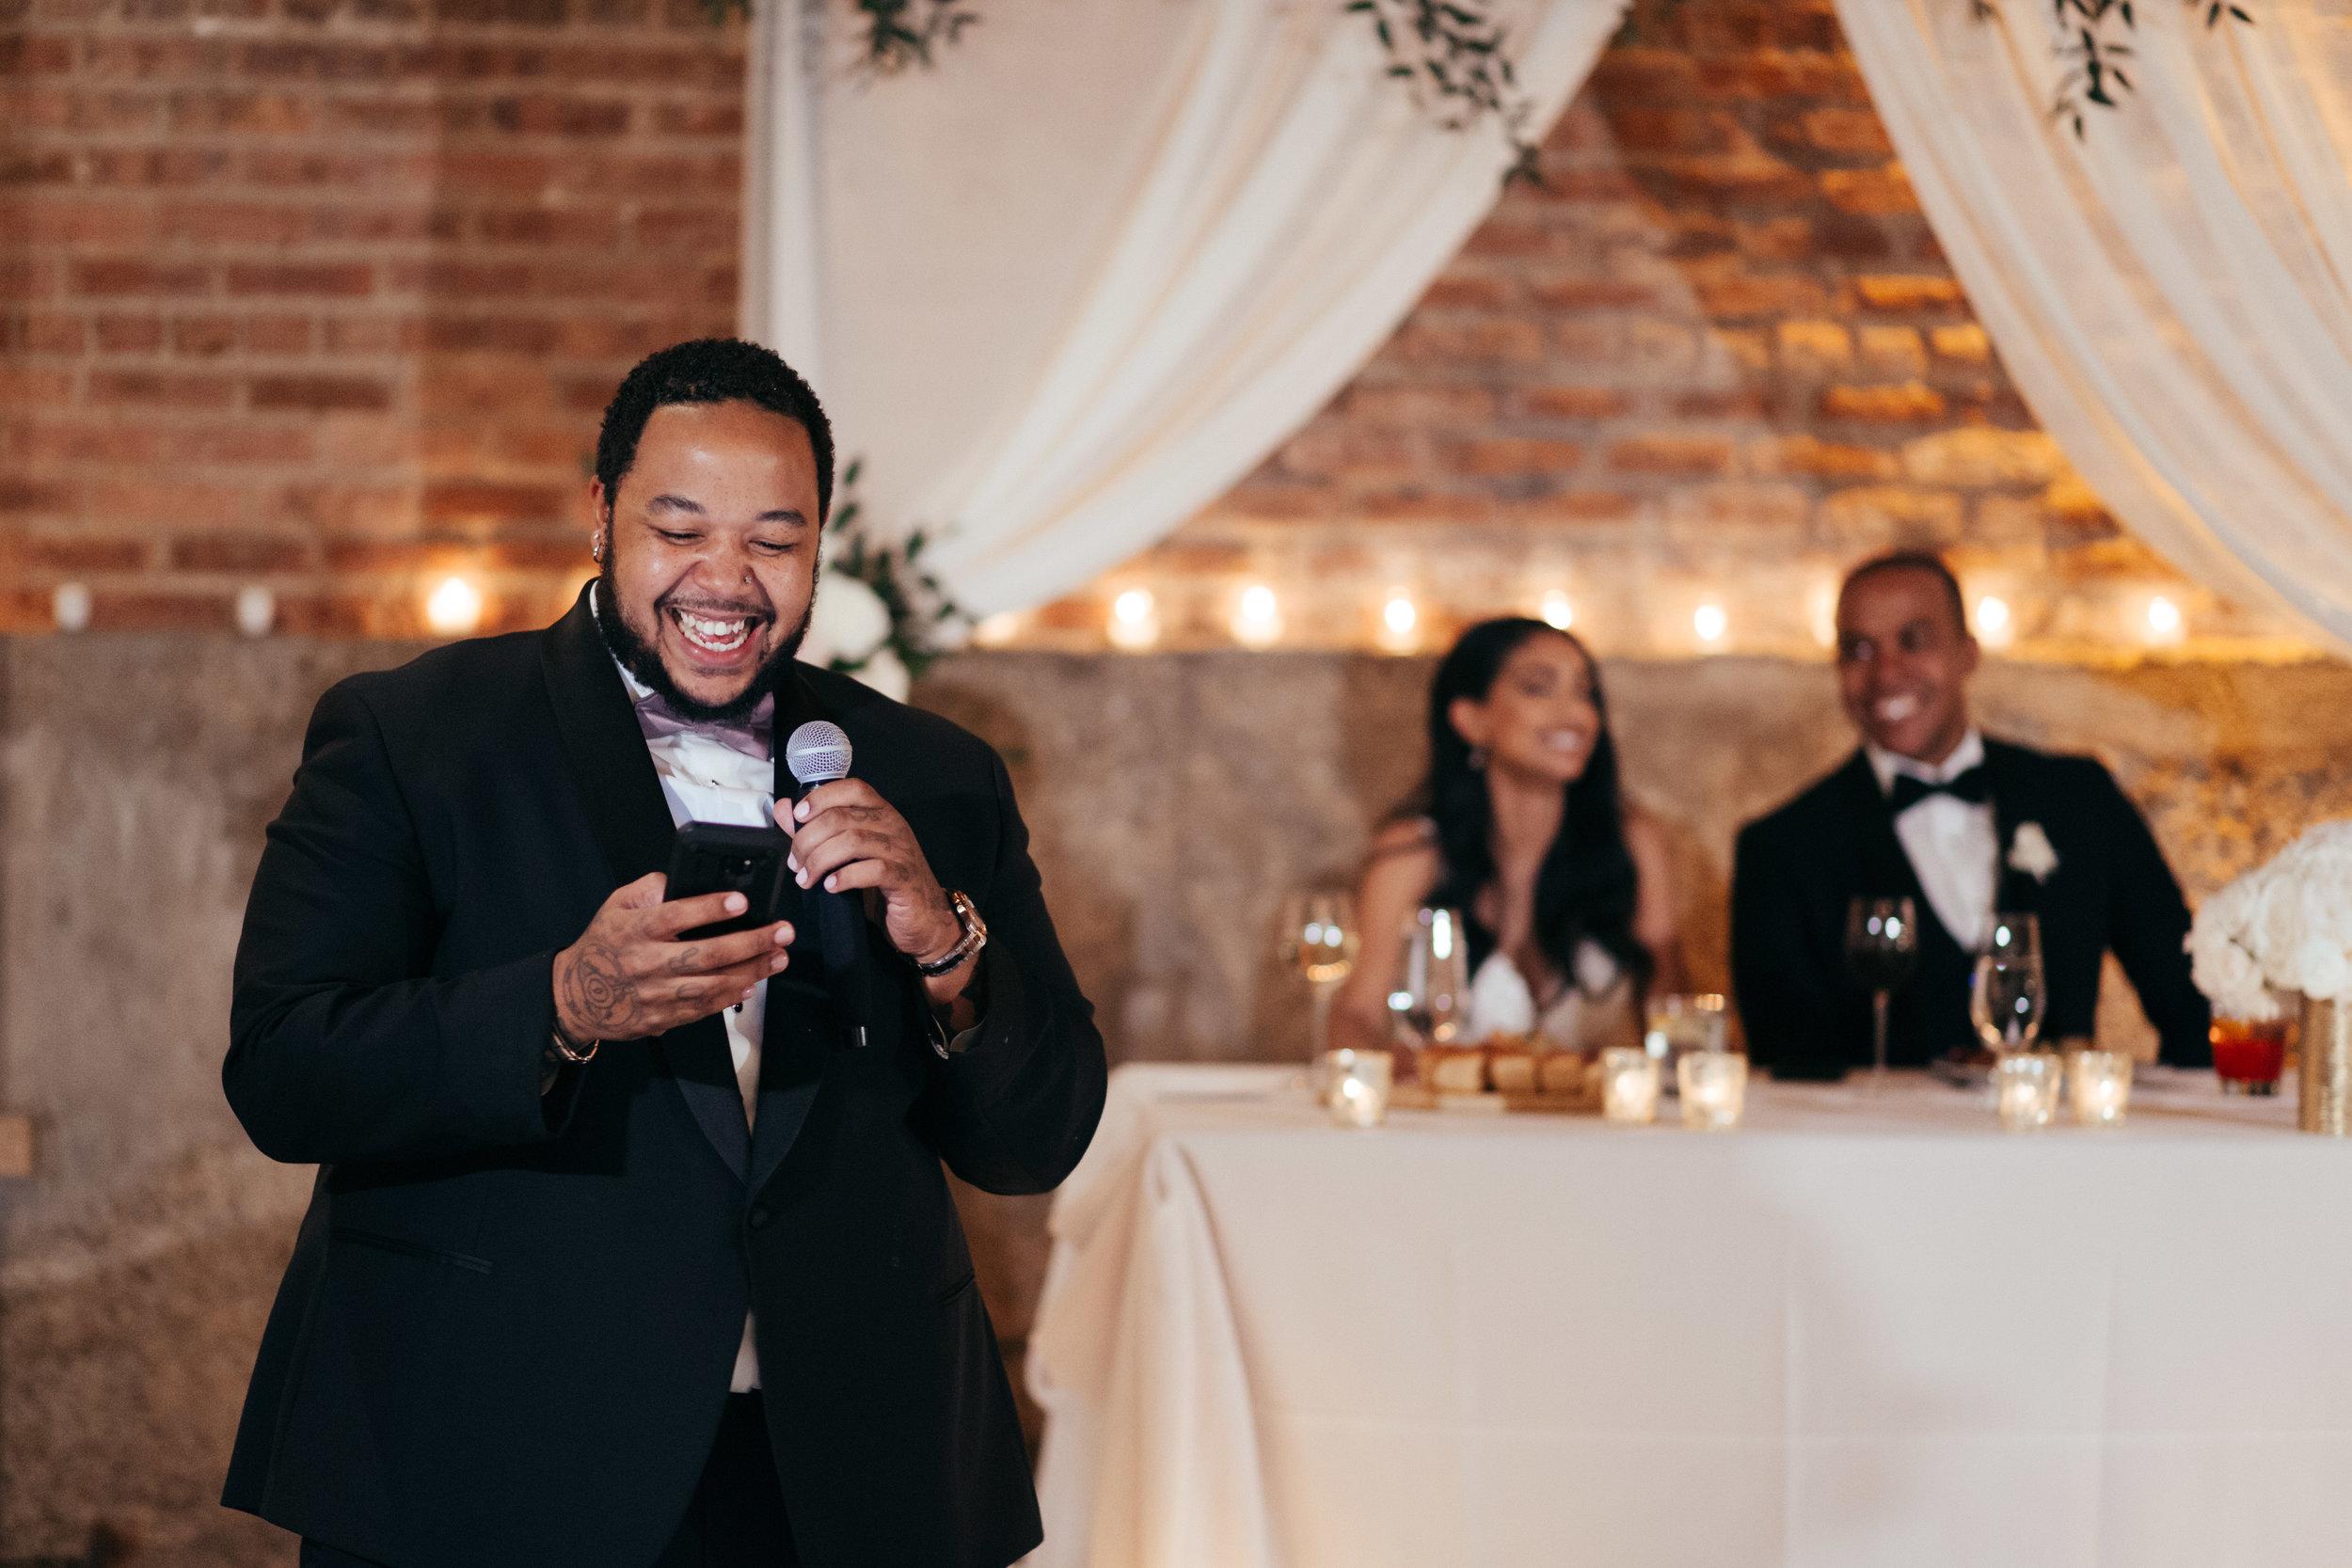 Mindy&Jared-wedding-by-LadiesAndGentlemen-by-Matija-Vuri-5348.jpg